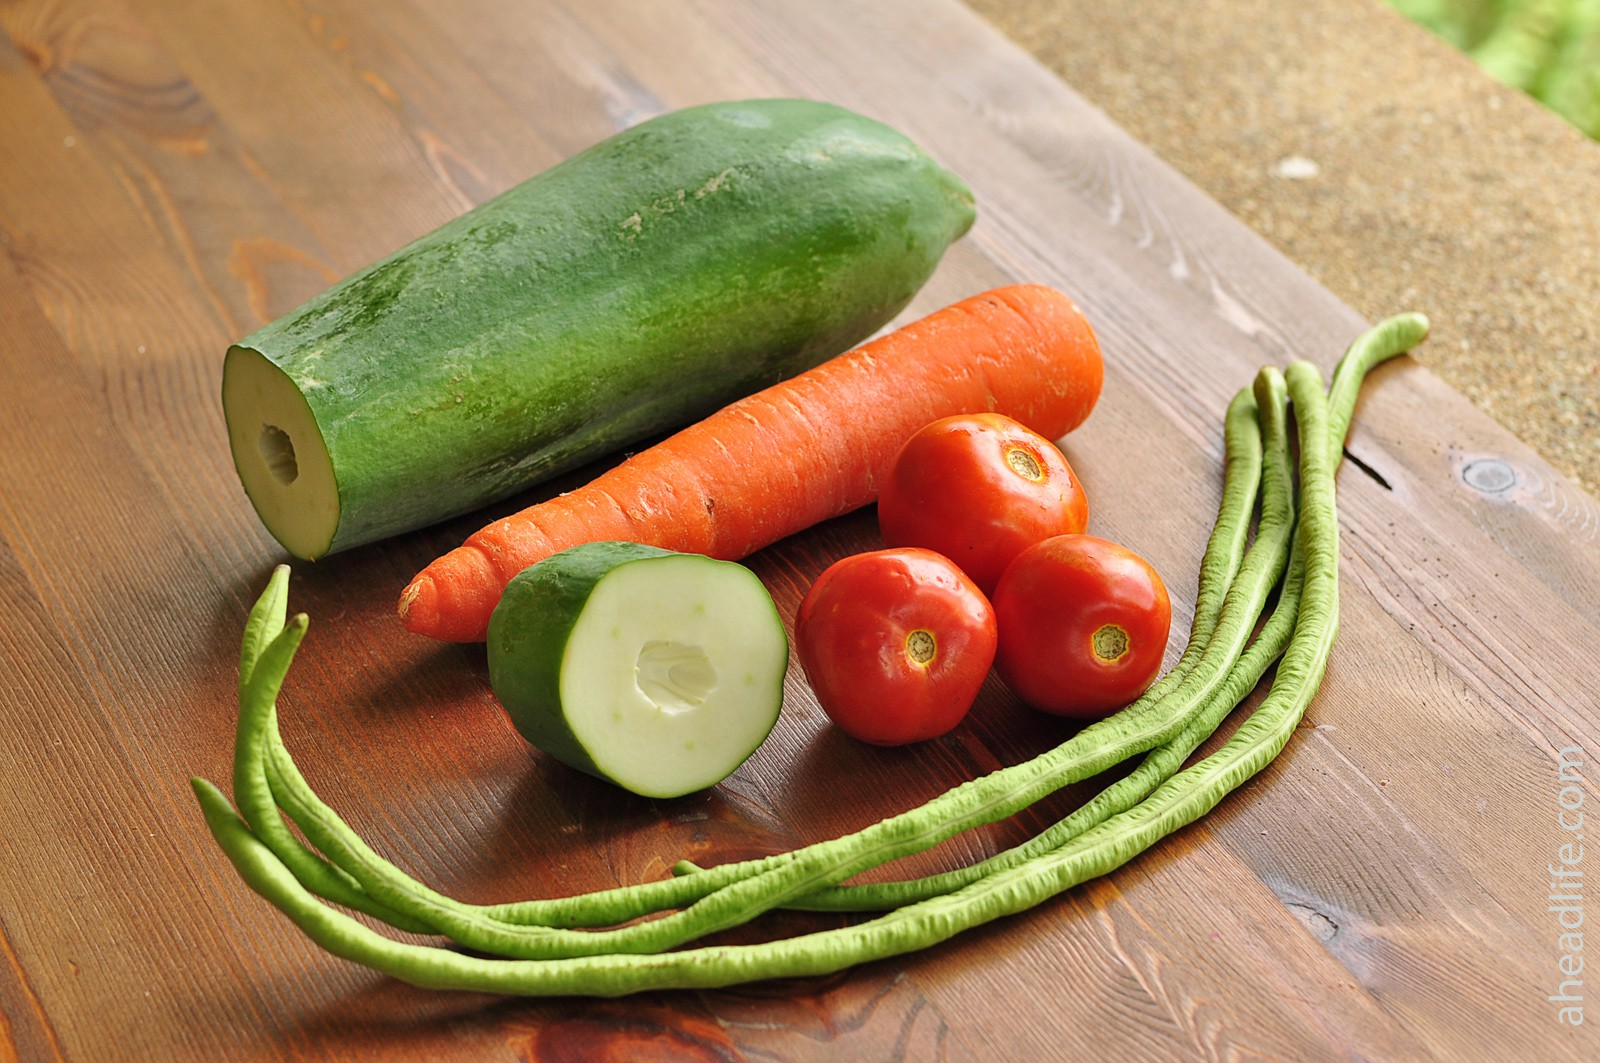 Салат из папайи Сам Том: ингредиенты